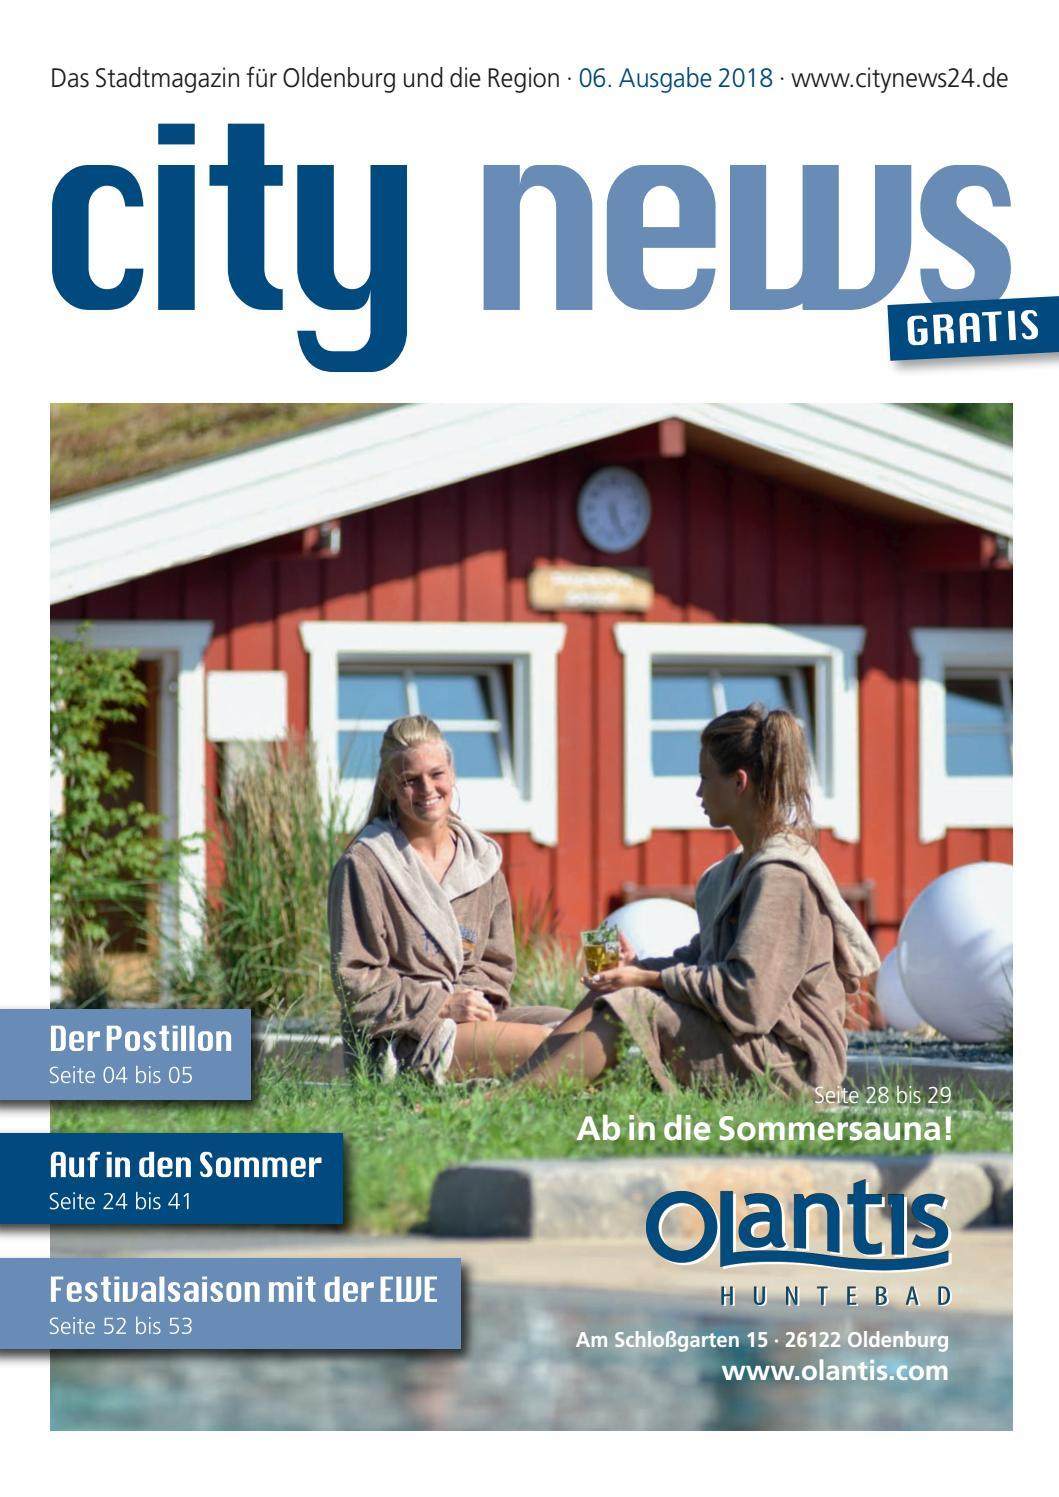 City News Oldenburg 6te Ausgabe 2018 By Citynews Oldenburg